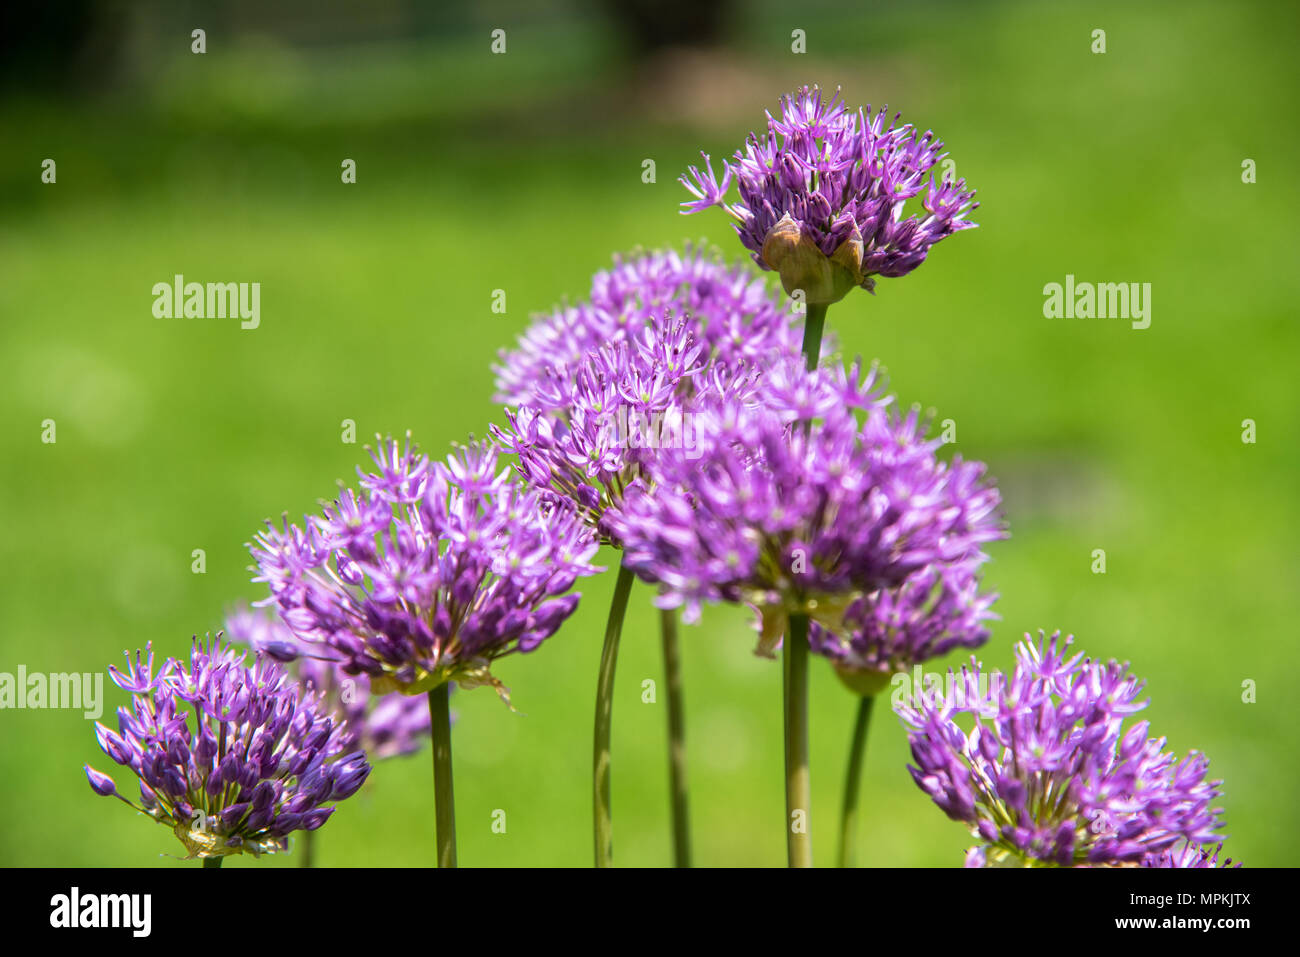 Allium 'Purple Sensation' - Stock Image